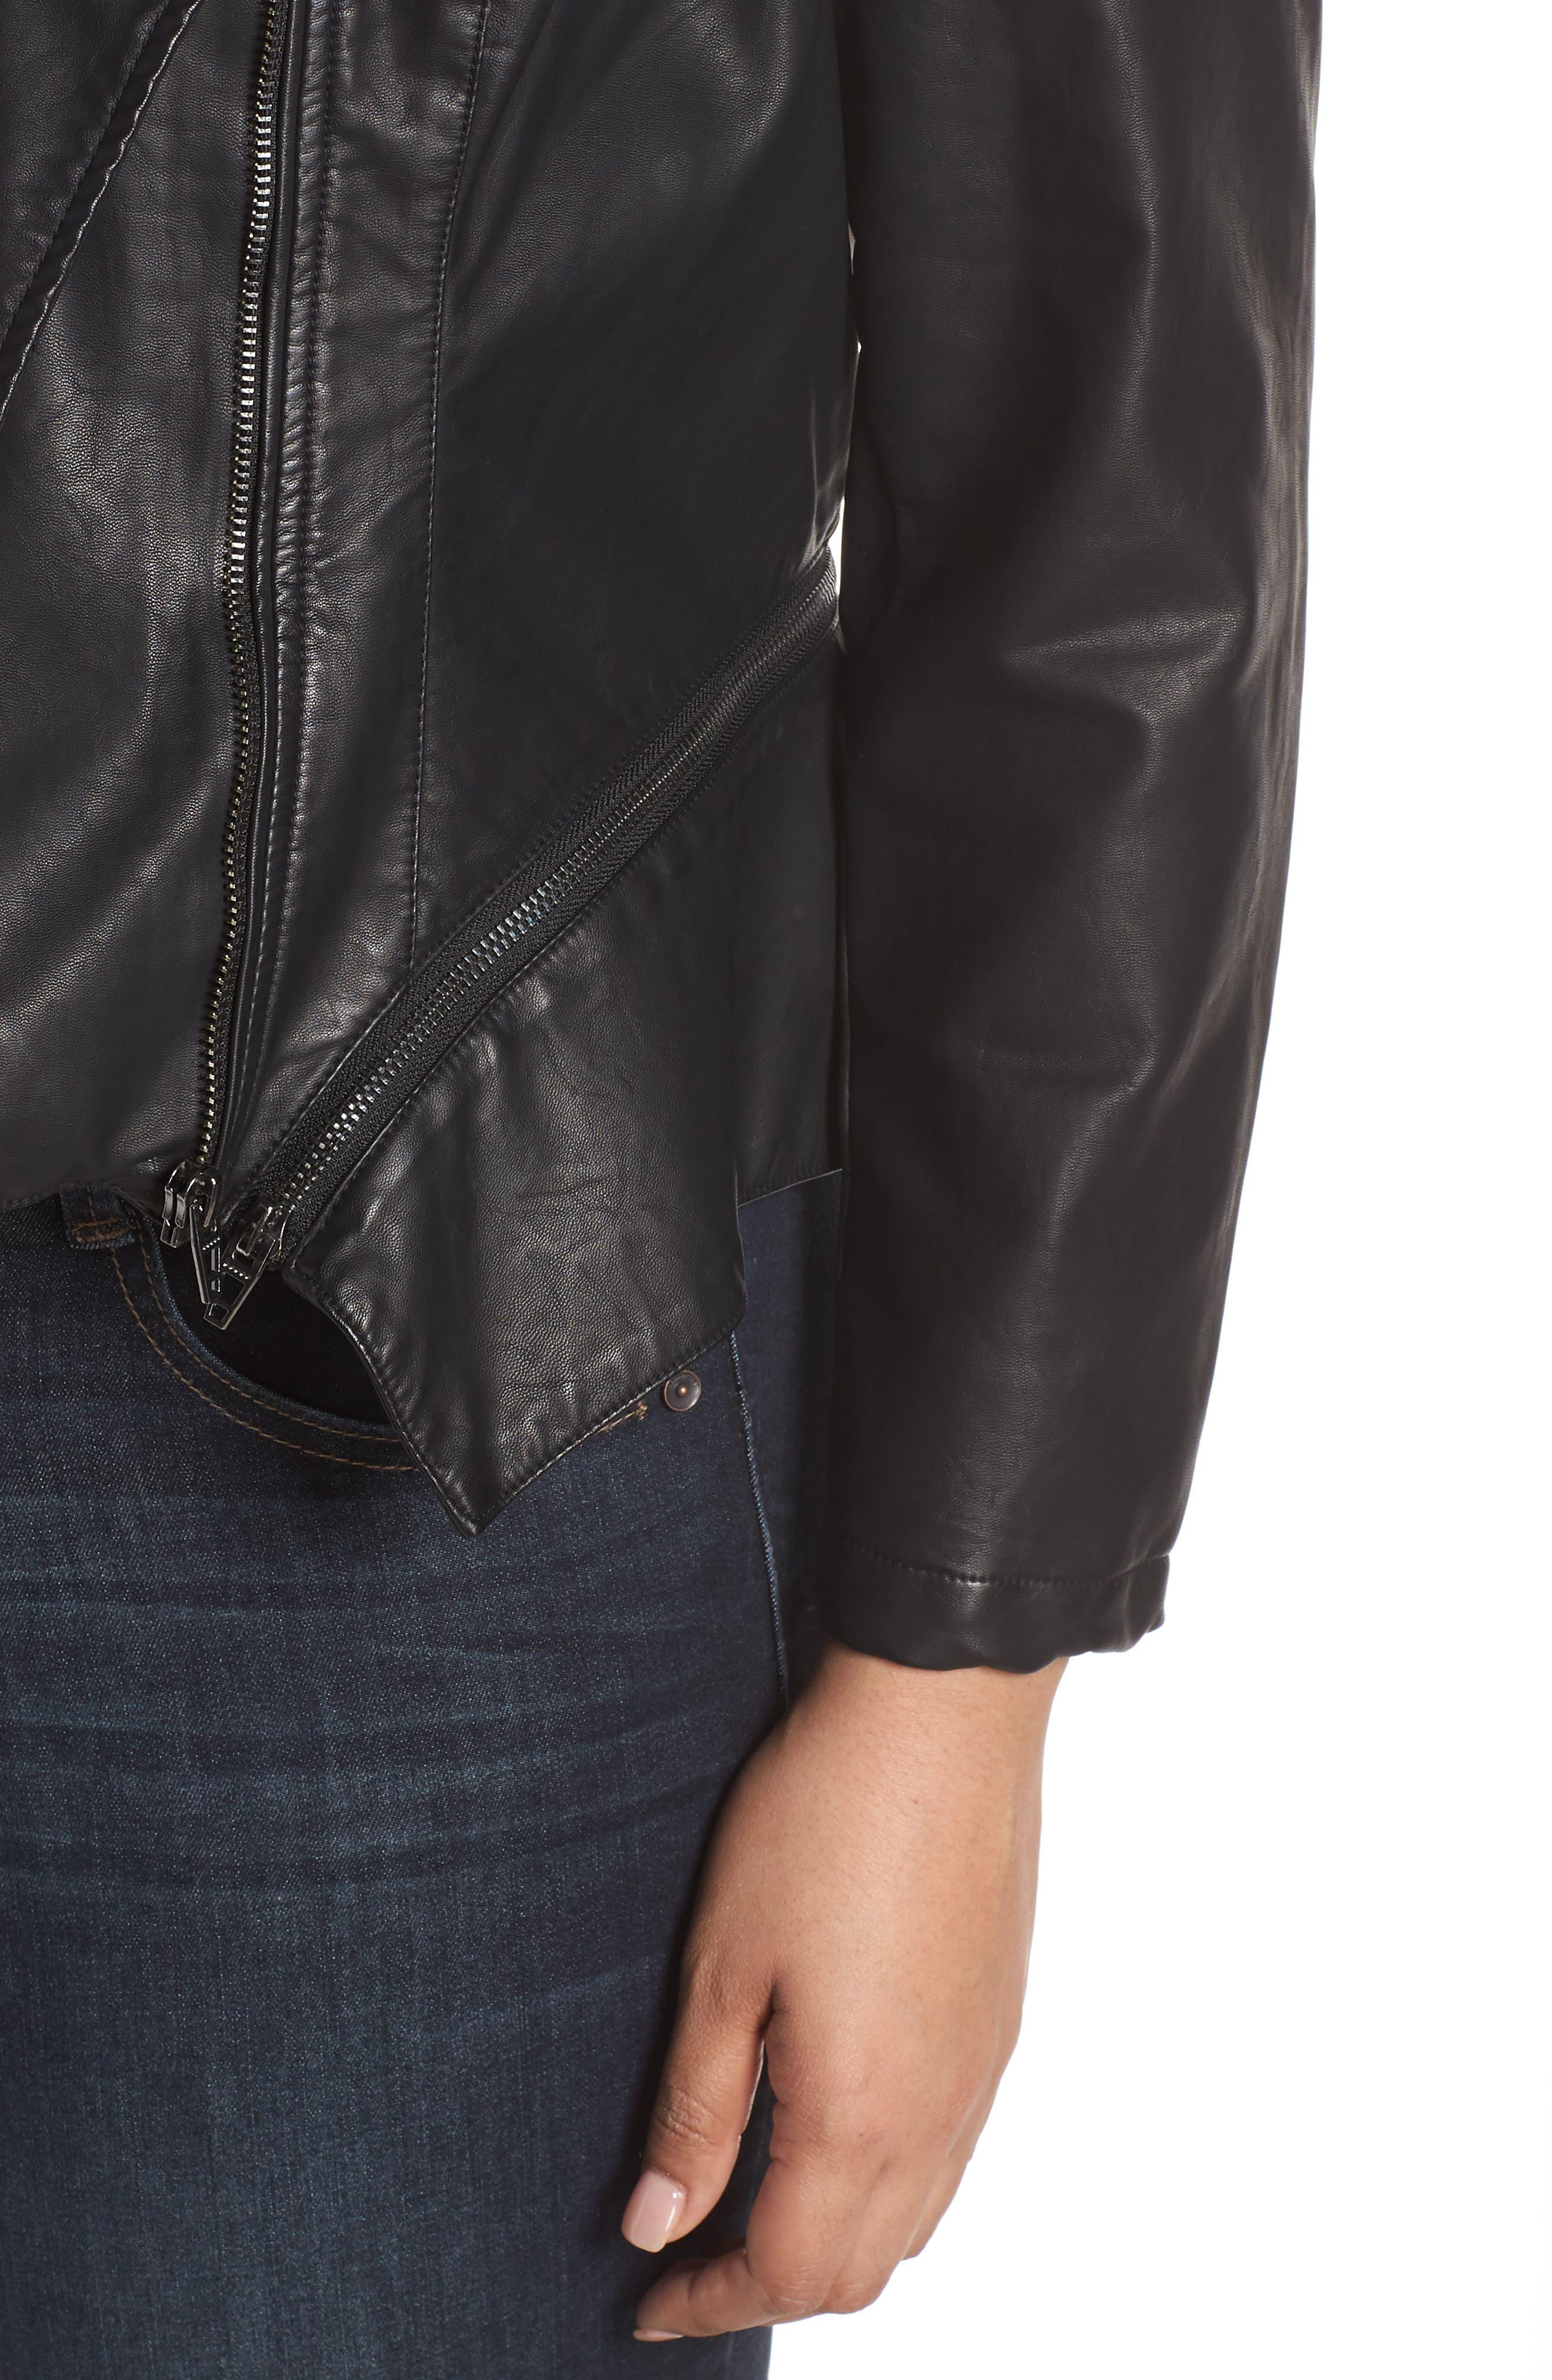 BLANKNYC, Faux Leather Moto Jacket, Alternate thumbnail 11, color, BLACK